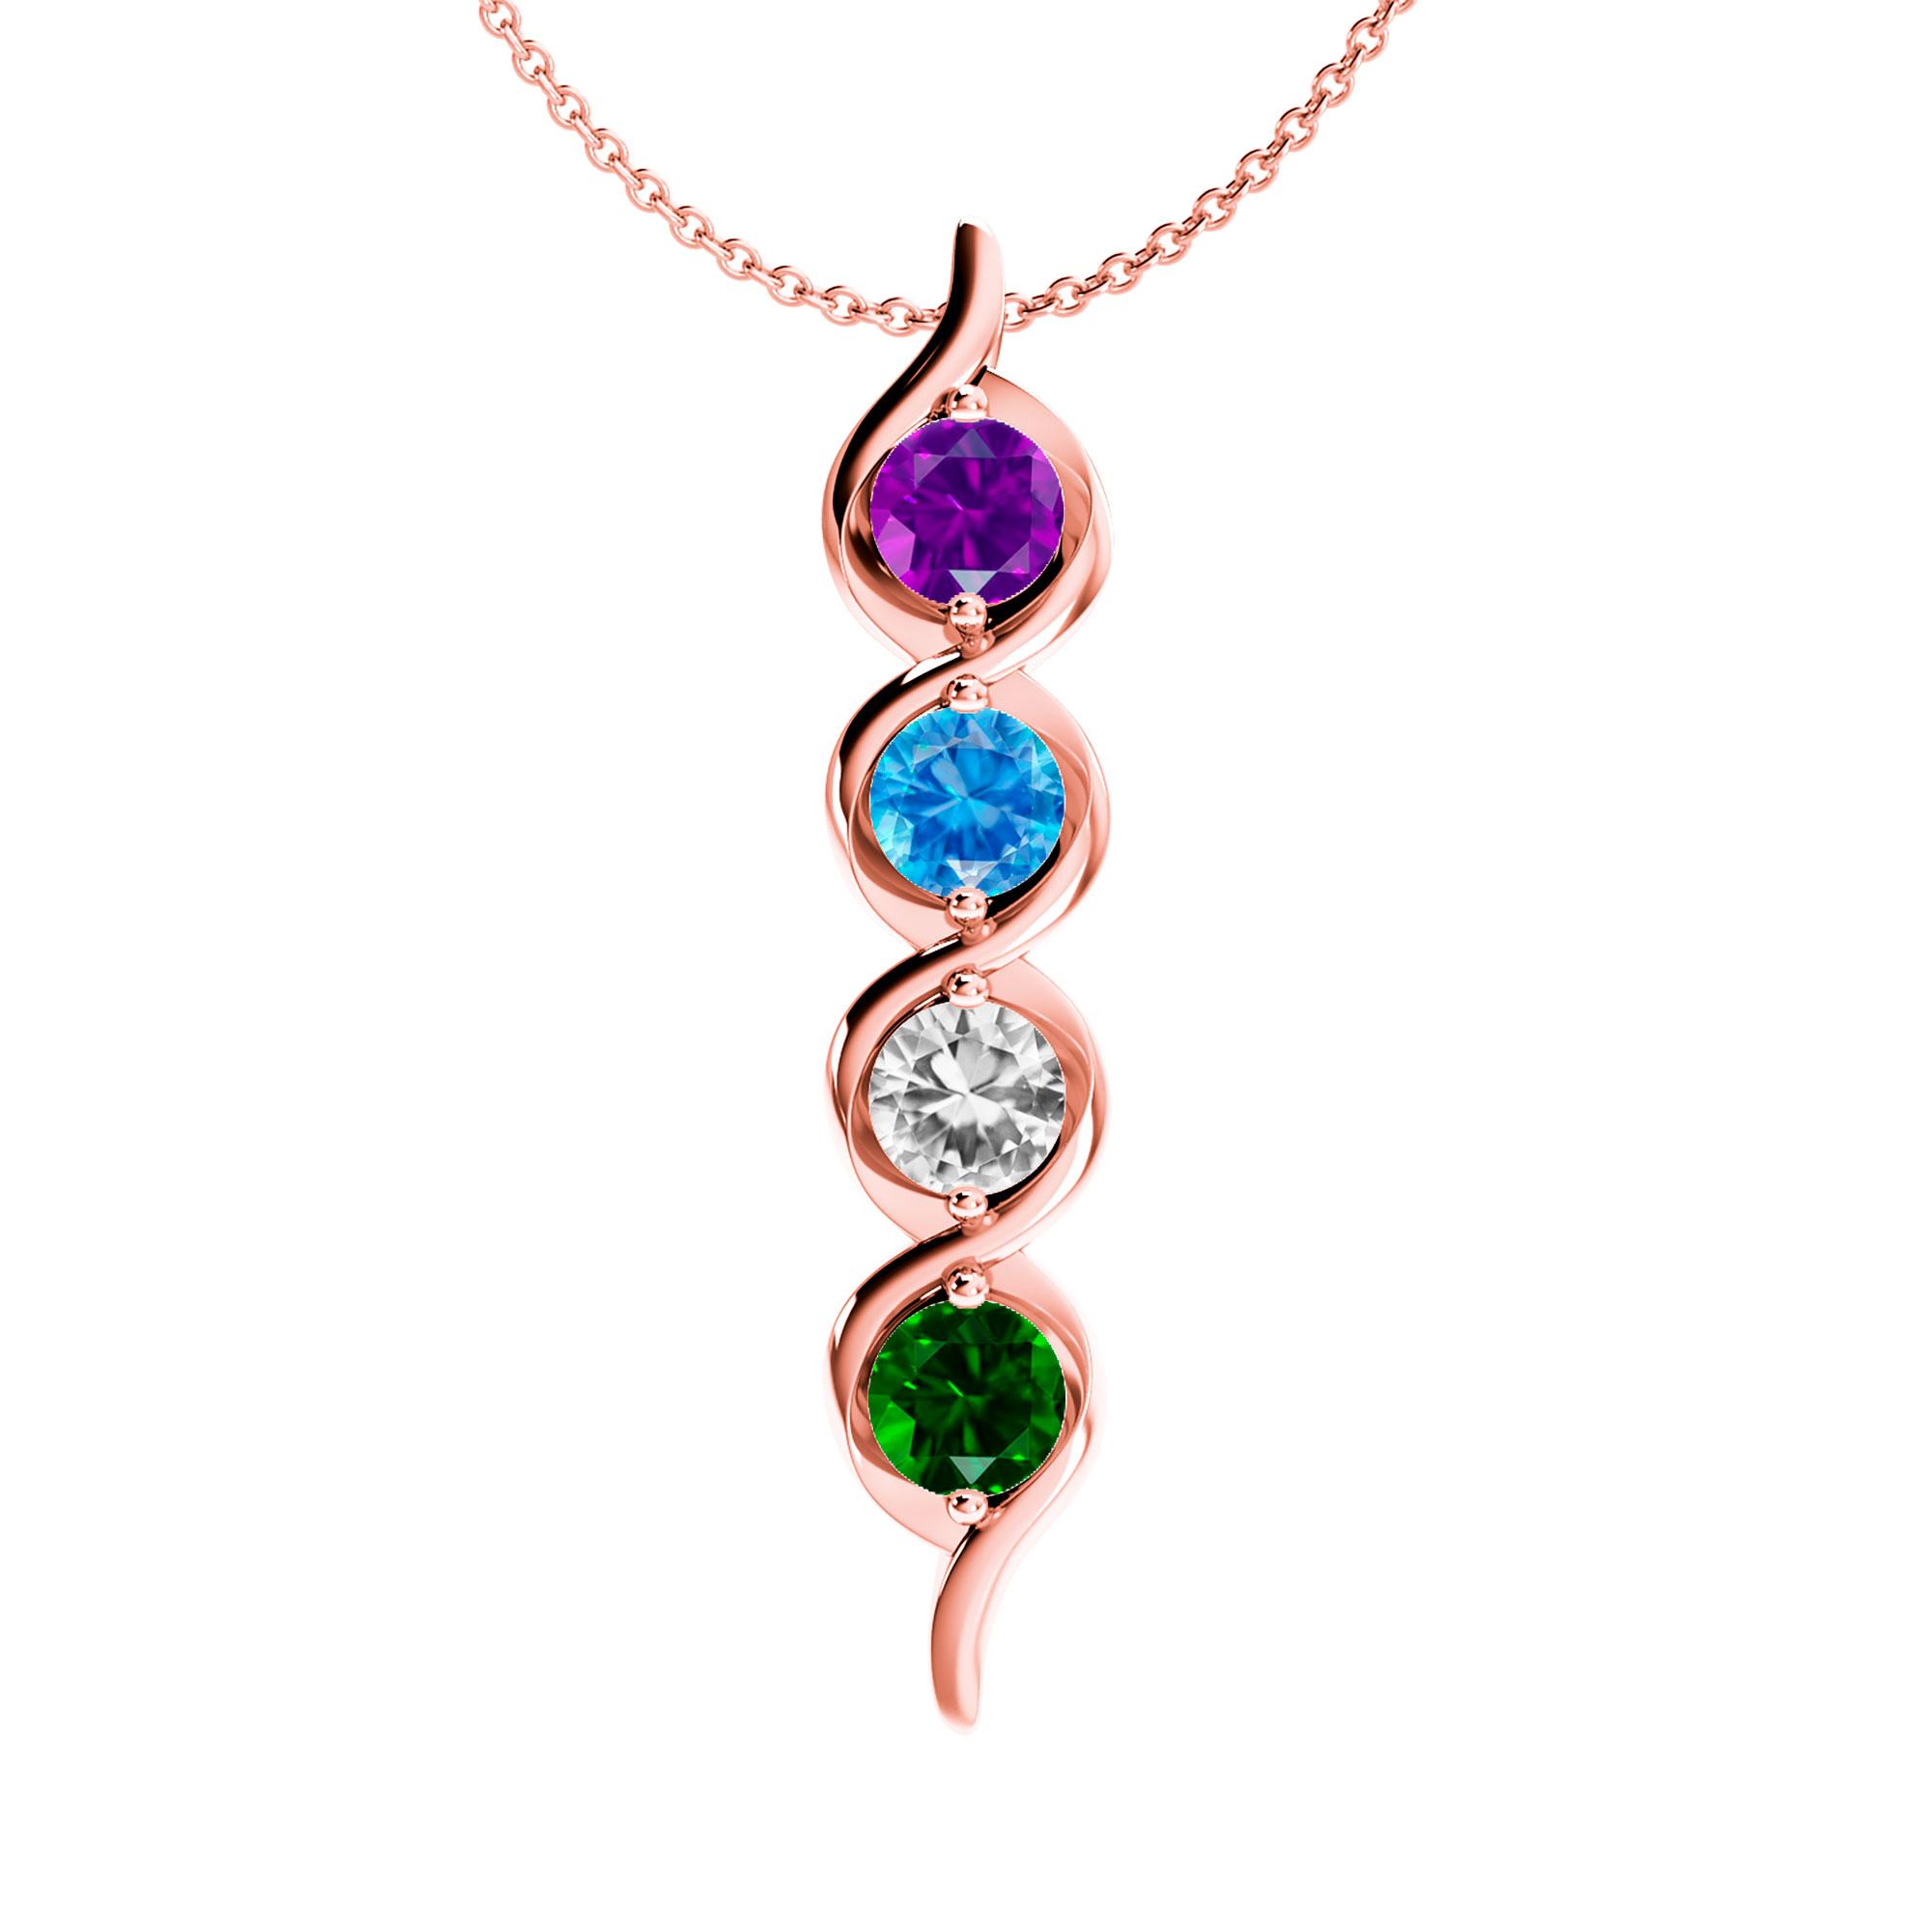 Mother's Custom Birthstone Cascading Family Pendant Necklace (2-4 Gemstones)